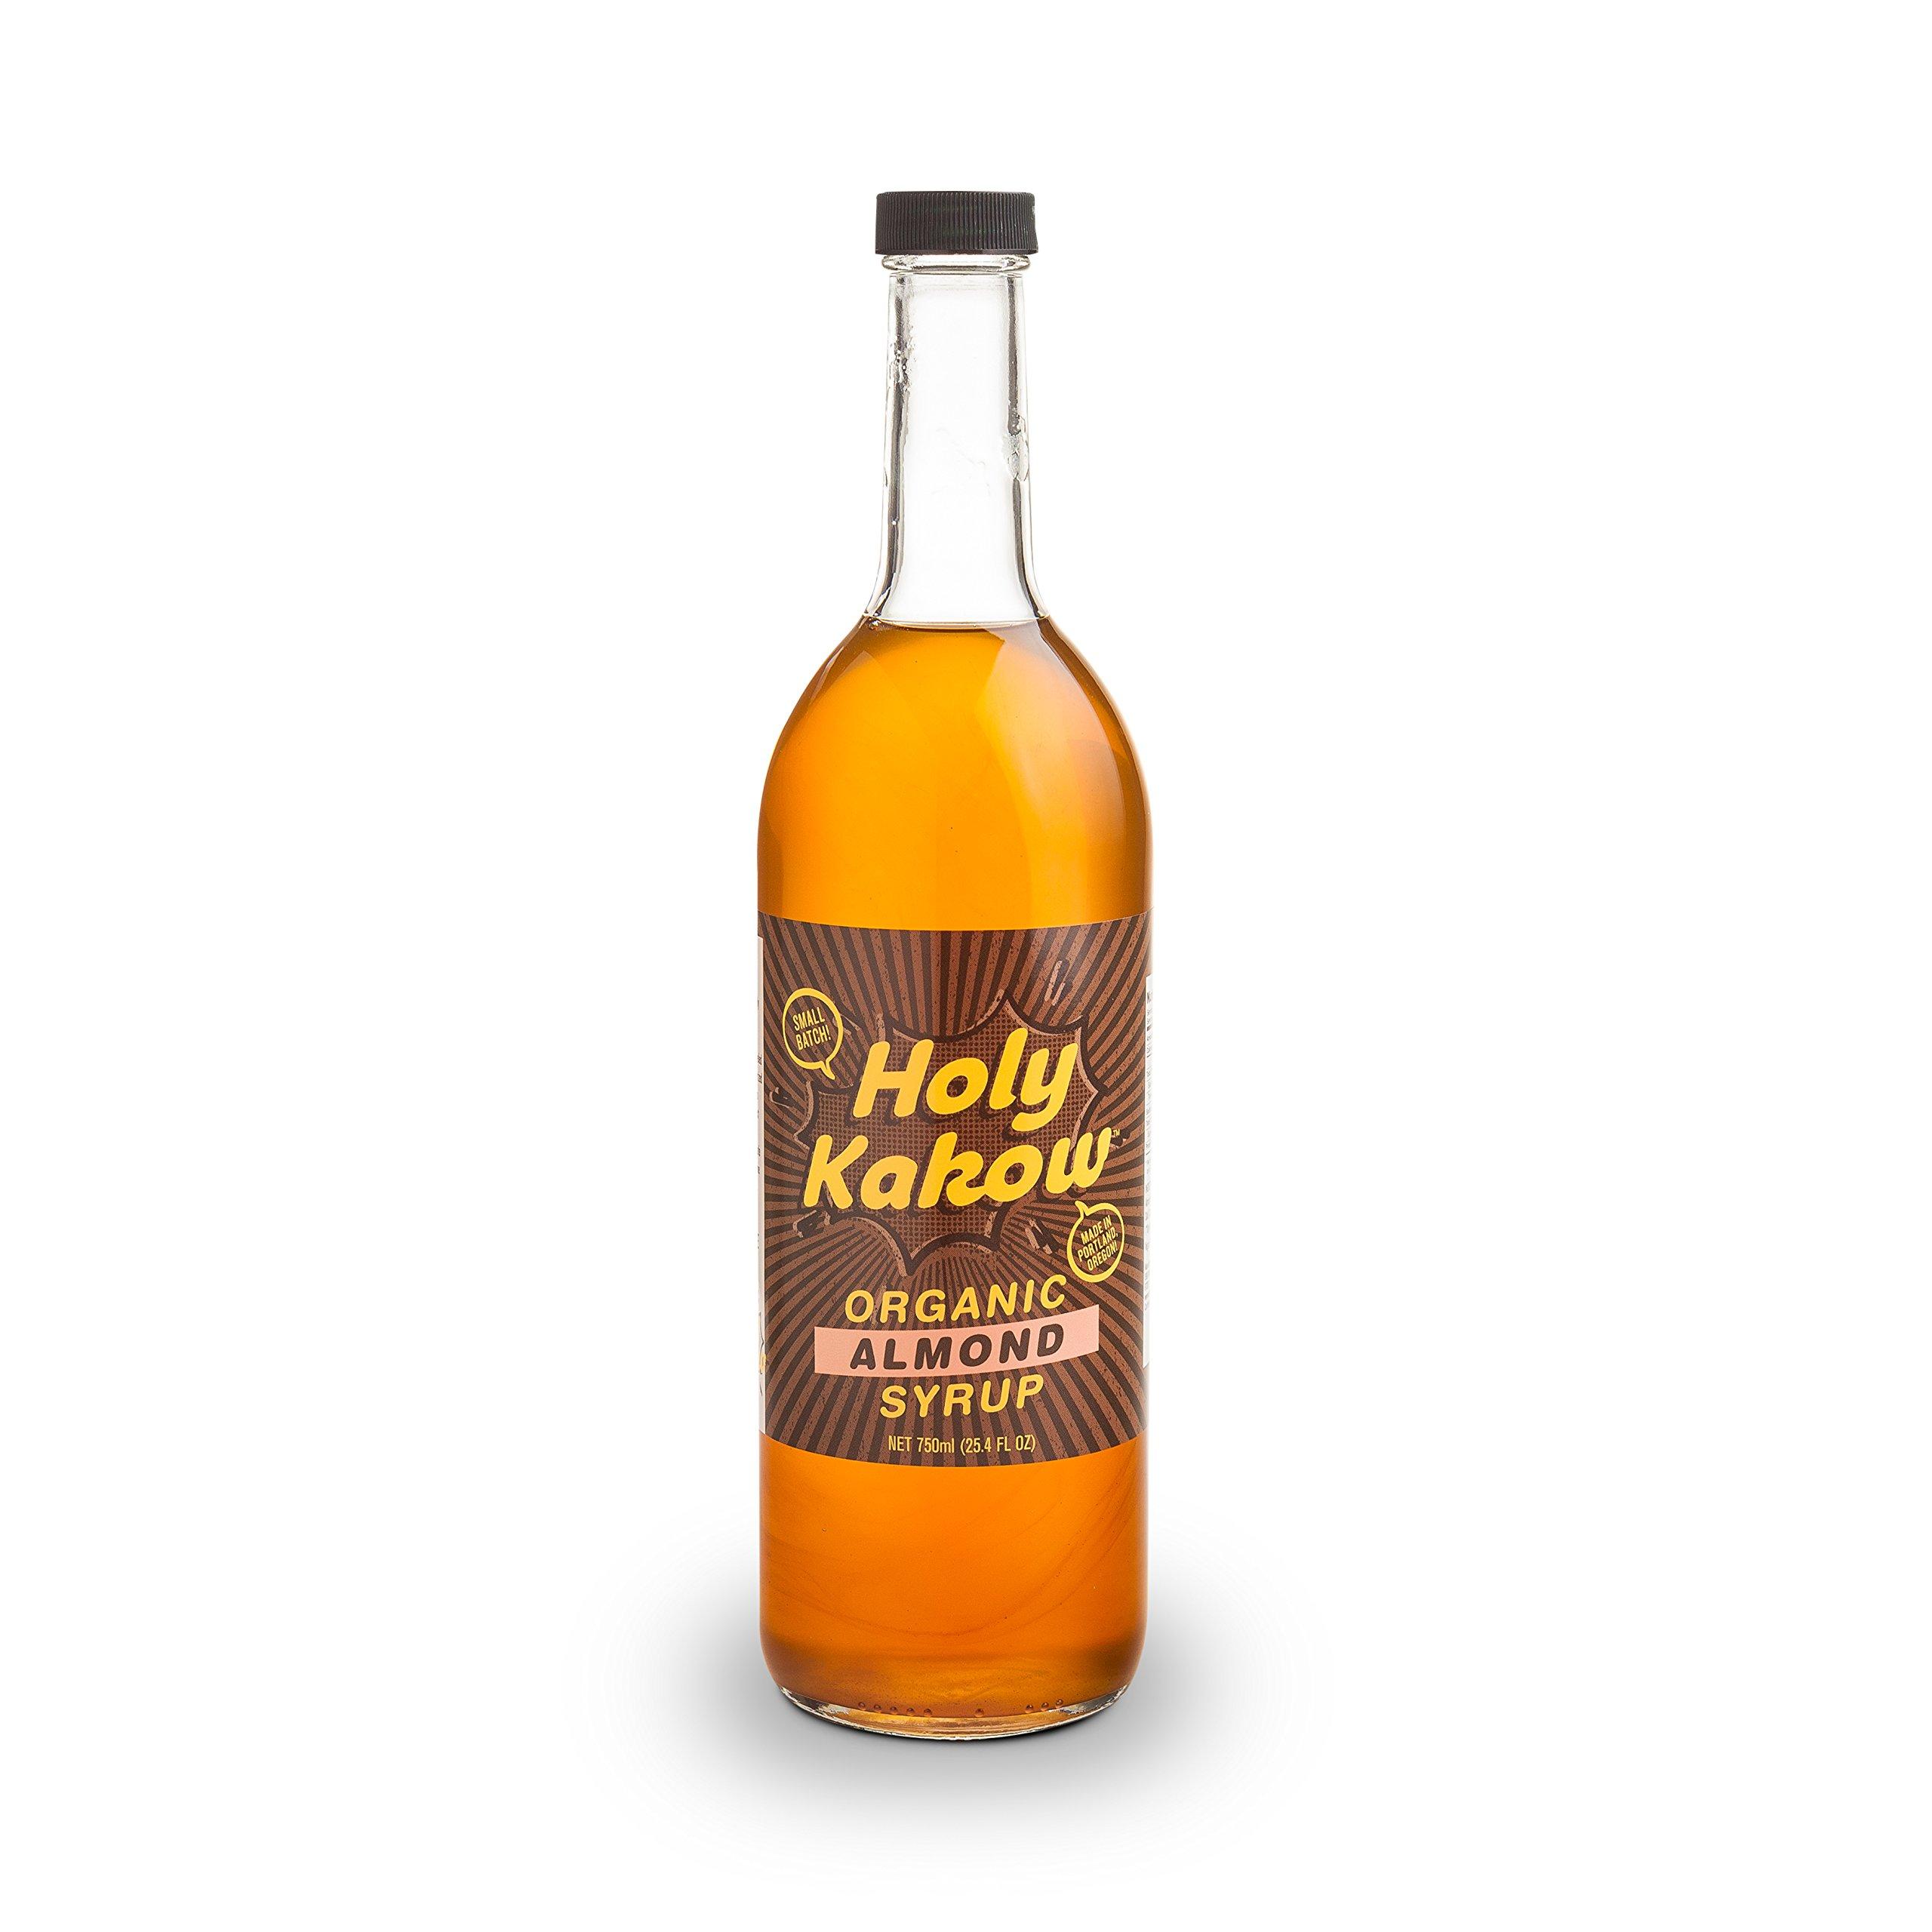 Holy Kakow Cafe Organic Almond Syrup - 750ml